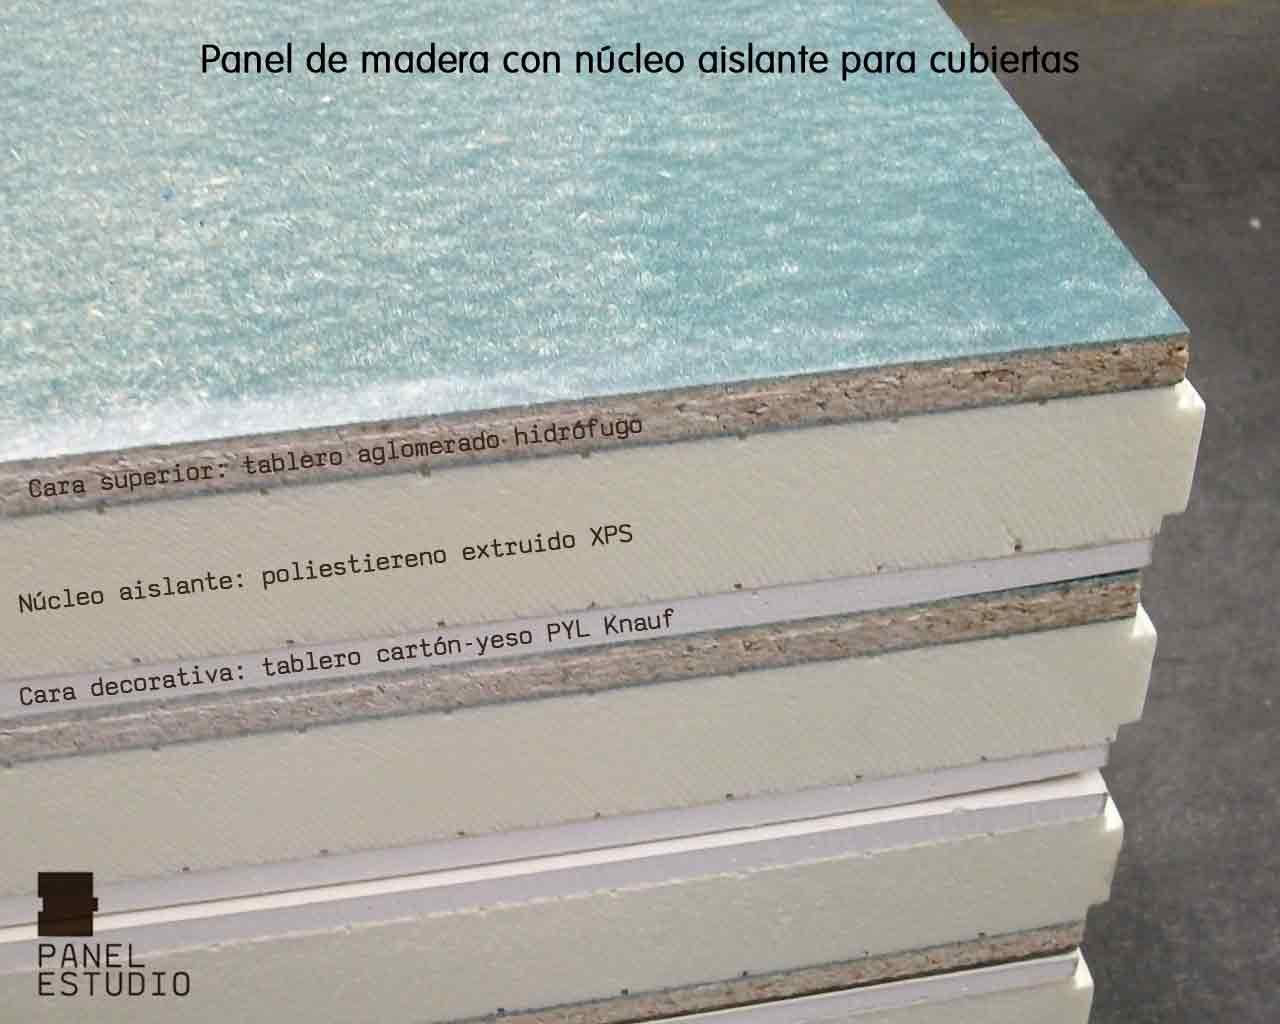 Panel de tejado acabado aglomerado hidr fugo for Aislante para tejados